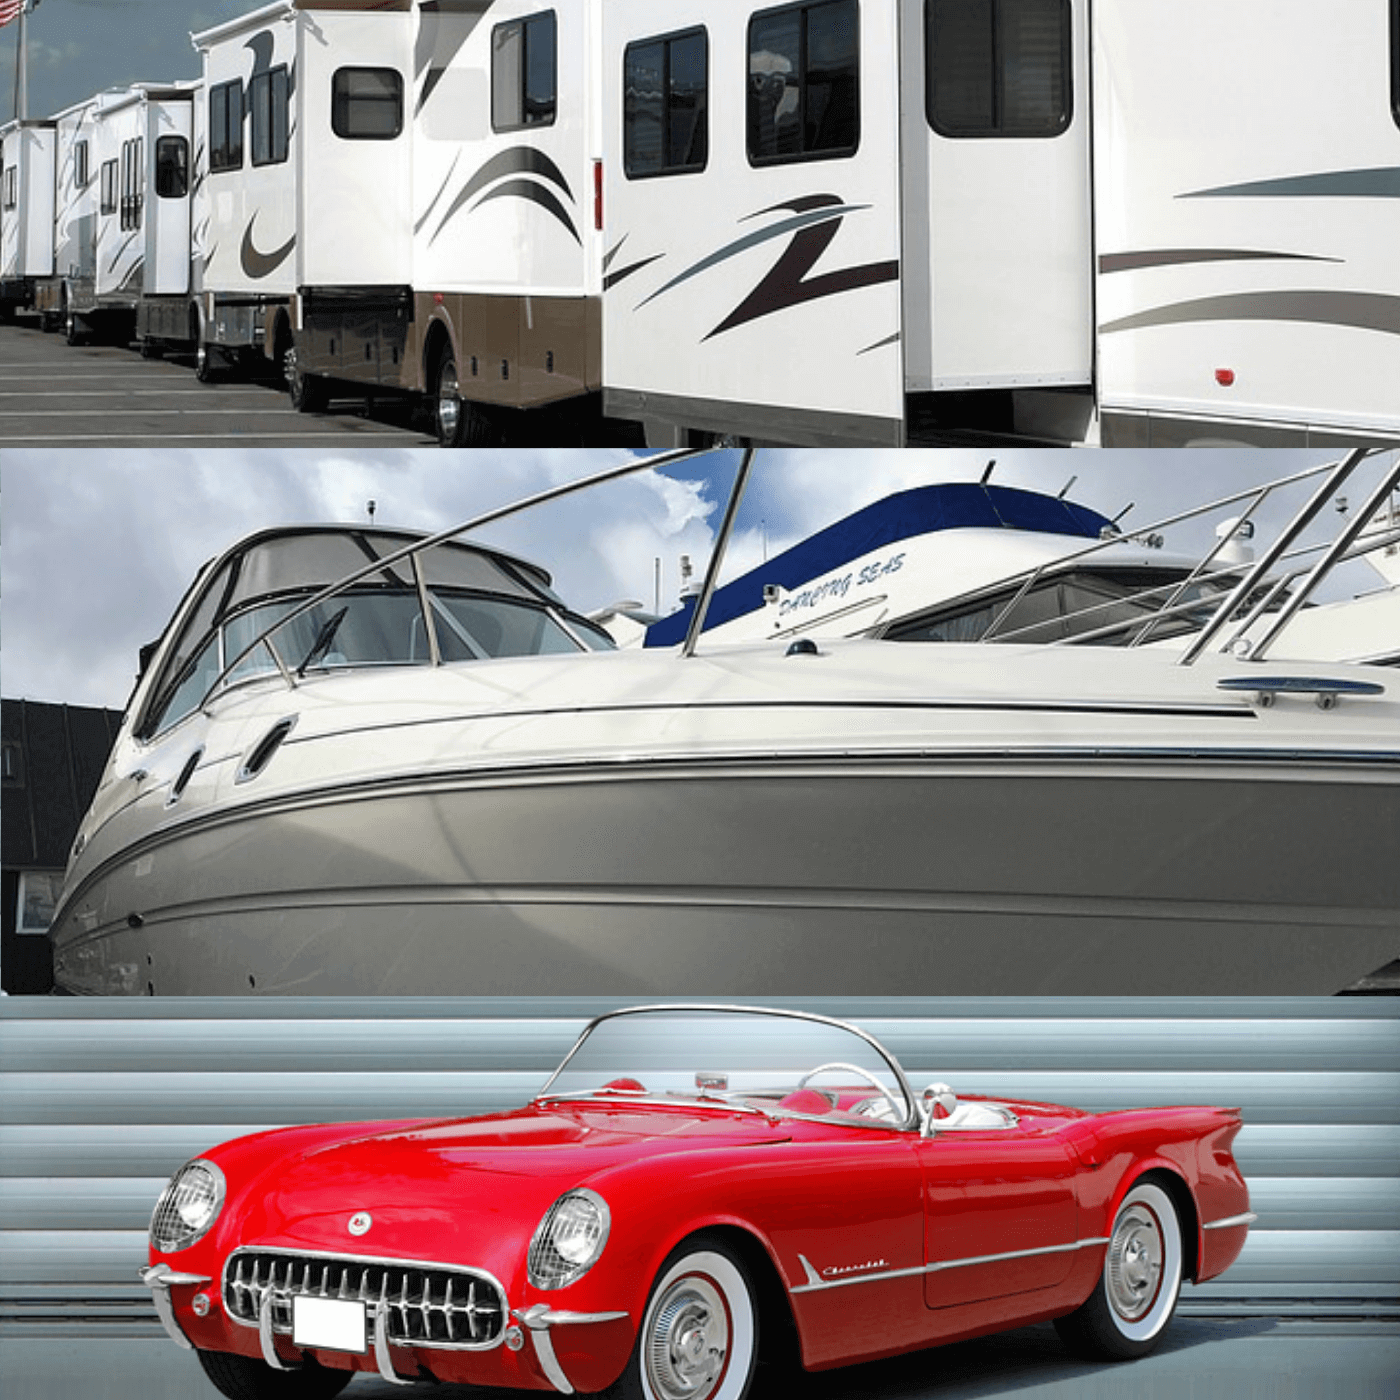 RV, Boat and Auto self storage offered at Sawnee Storage